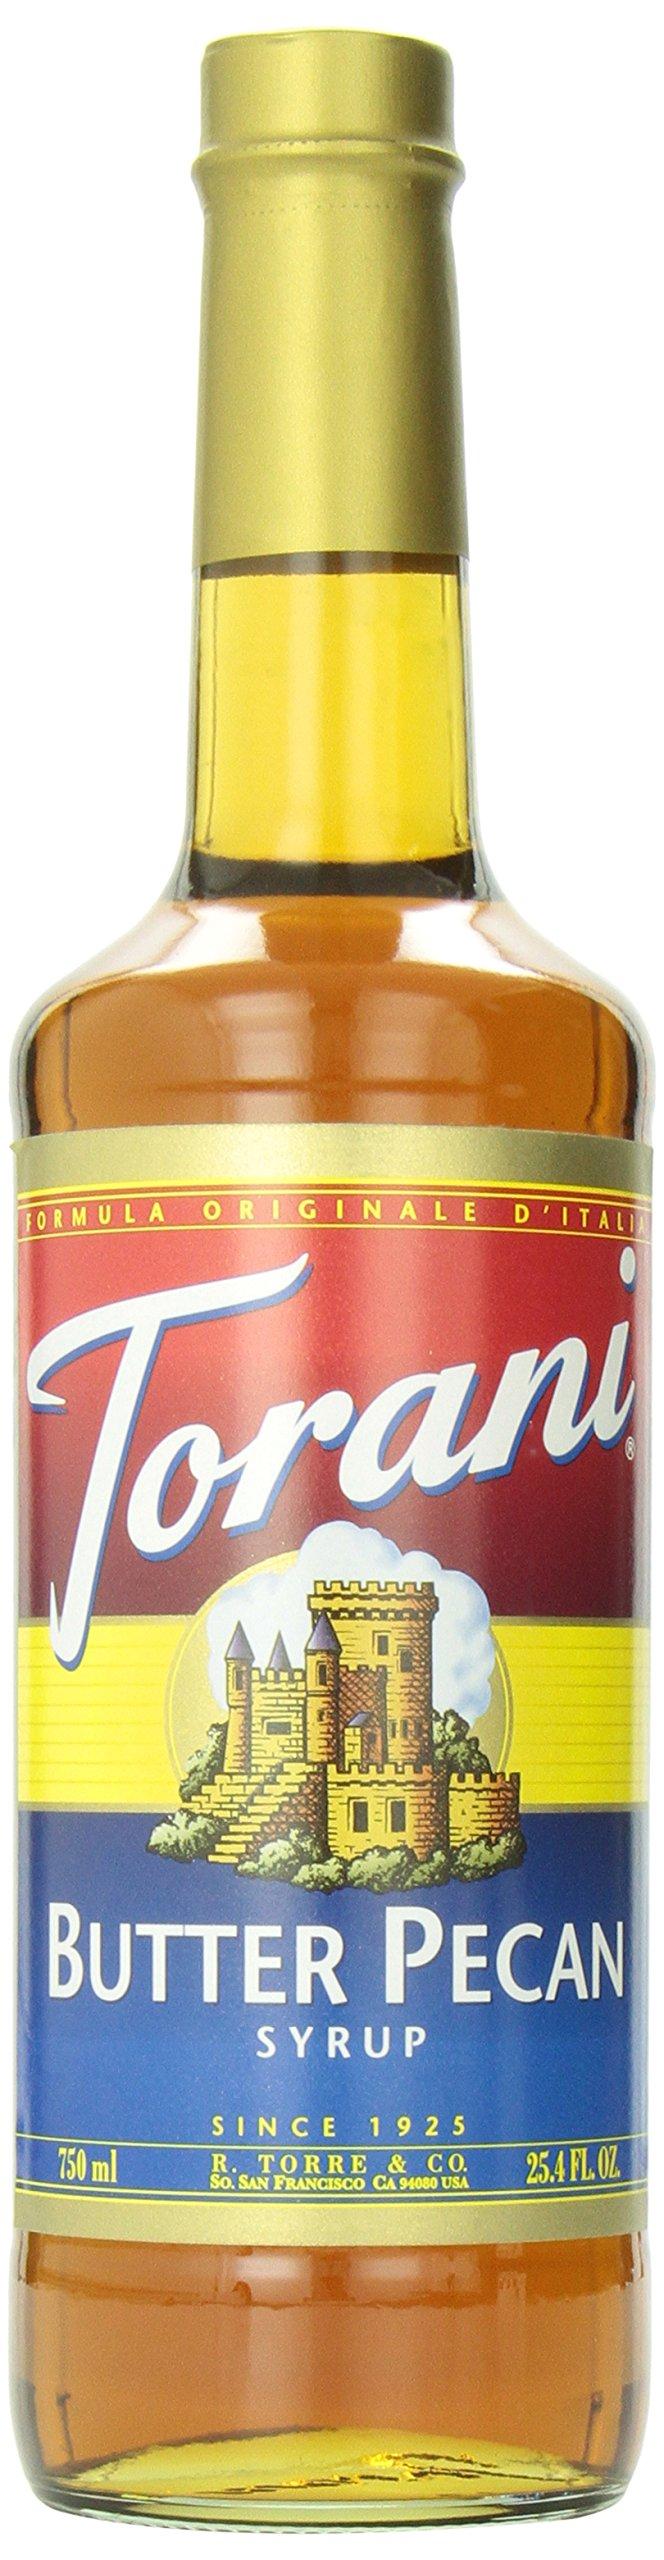 Torani® Butter Pecan Syrup by Torani